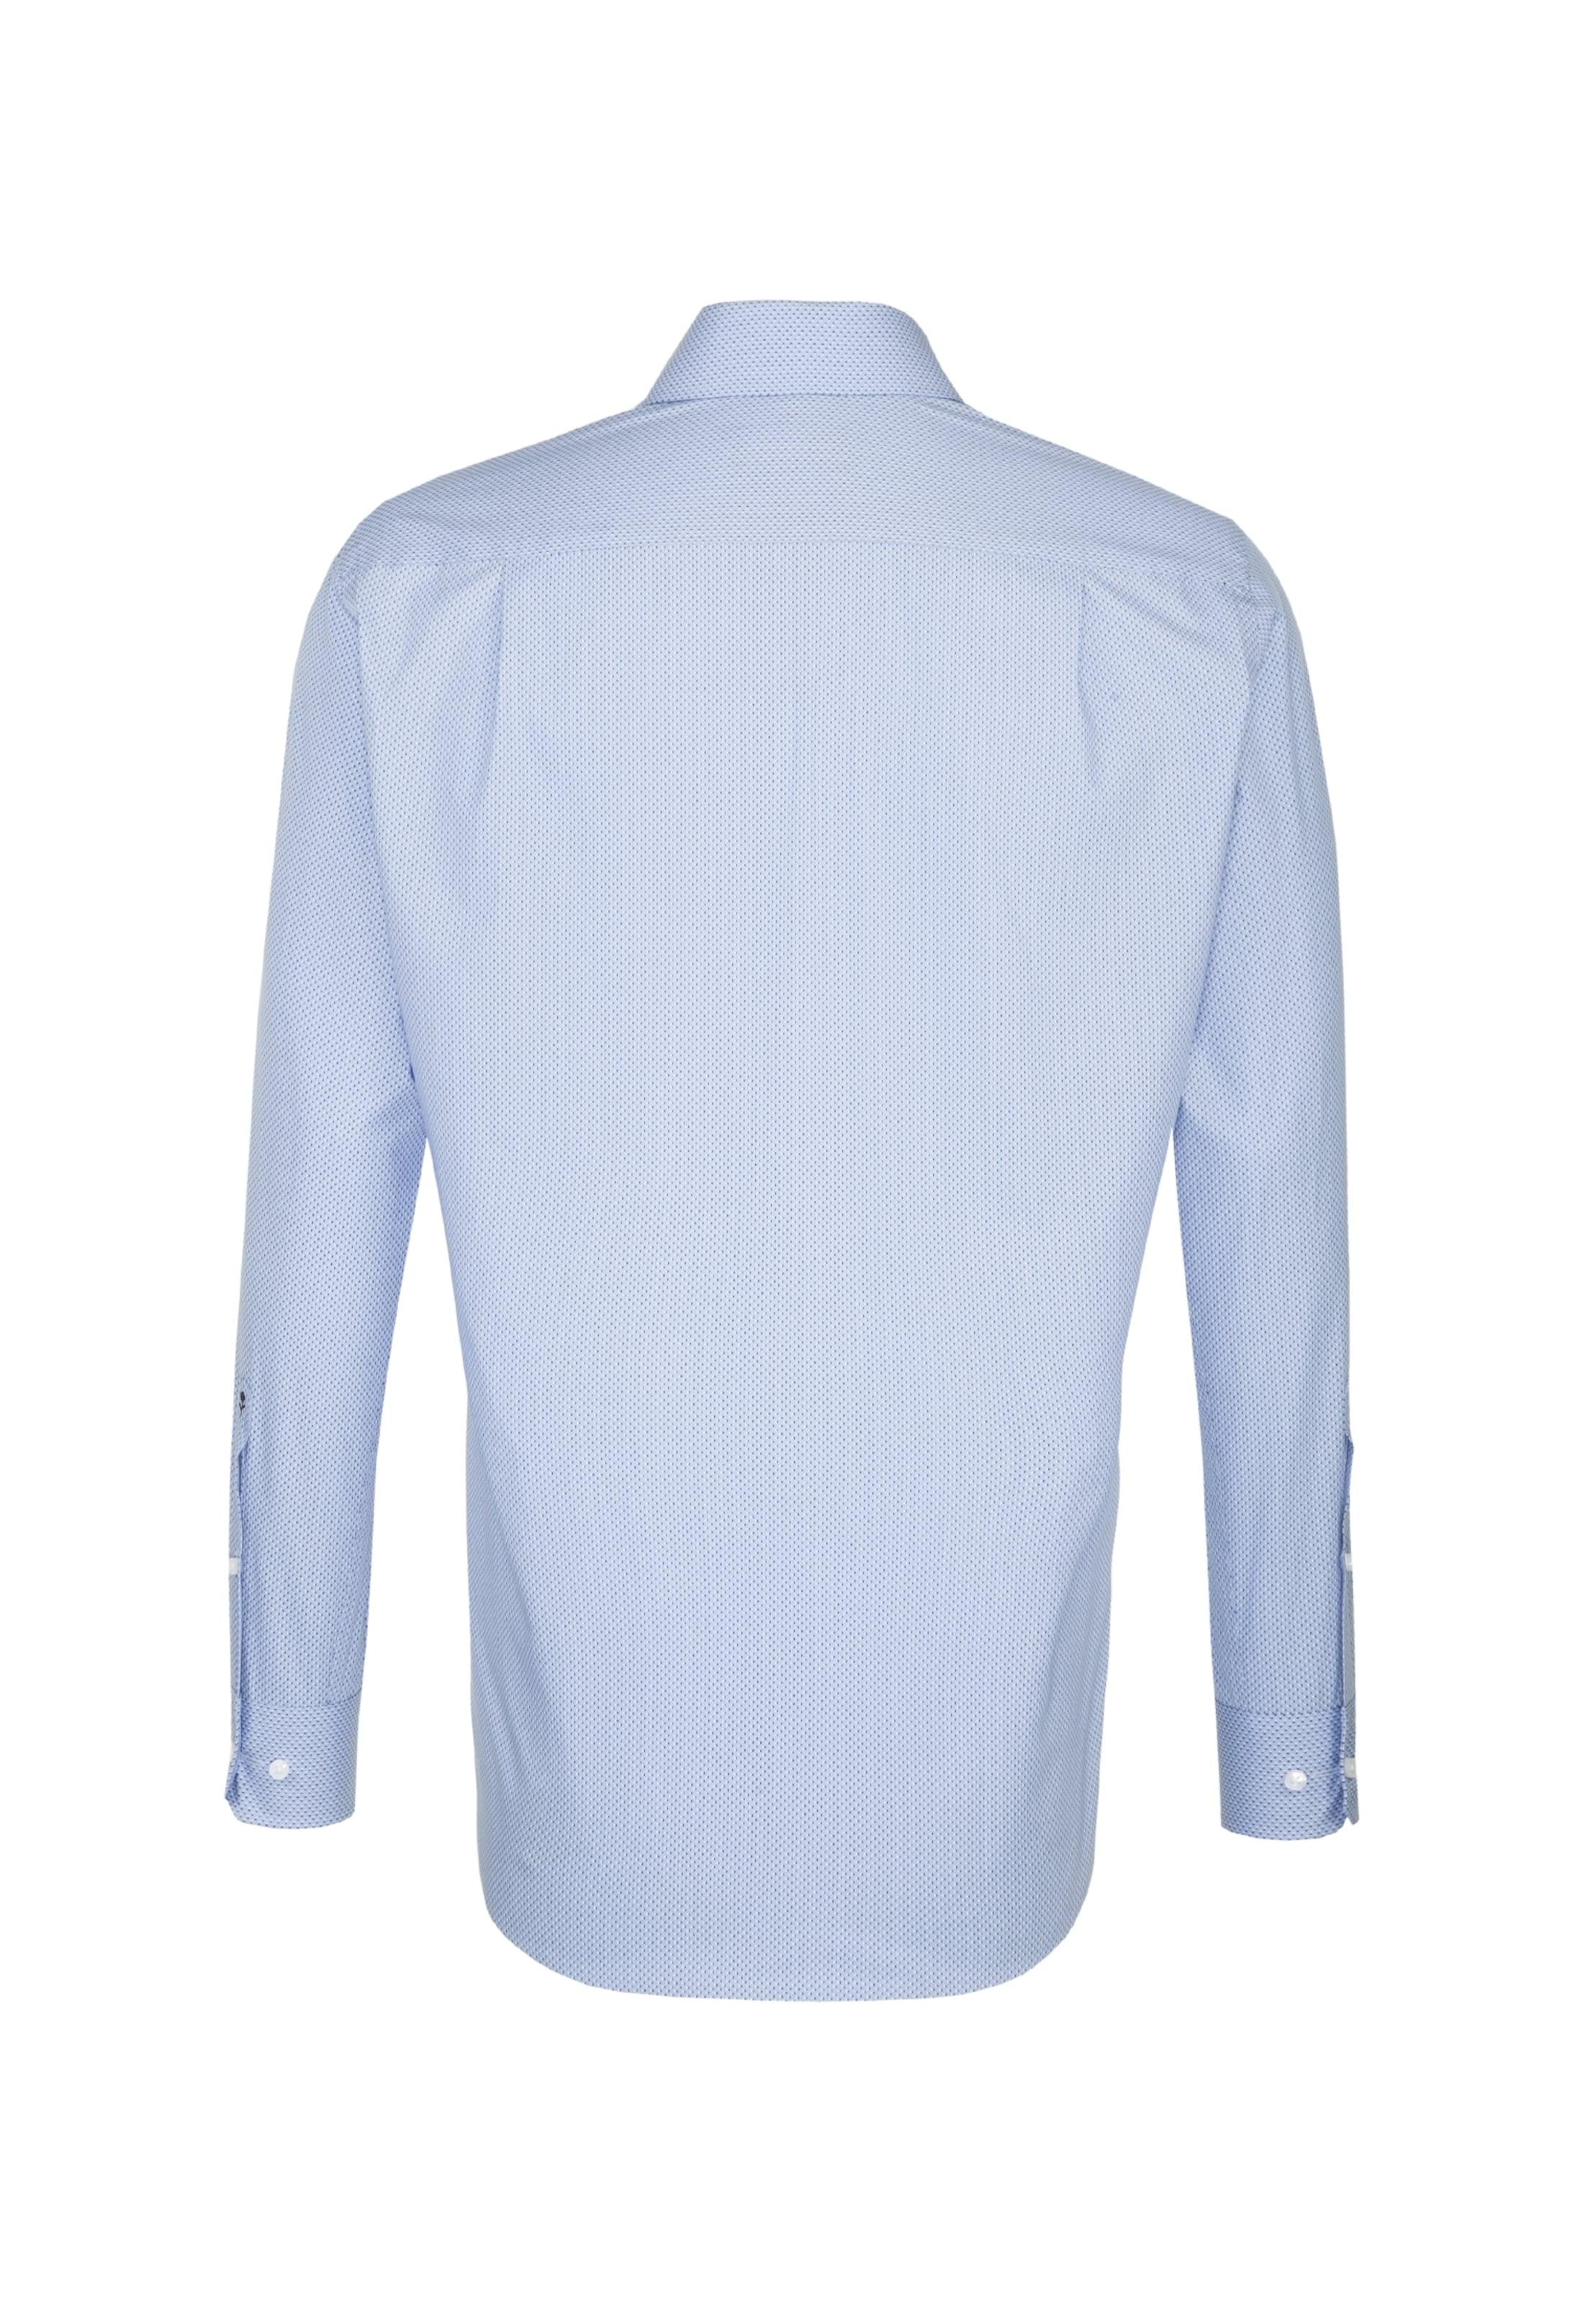 Seidensticker Hemd Seidensticker In Hemd Hemd BlauHellblau In Seidensticker Hemd BlauHellblau In BlauHellblau Seidensticker ukXZiOP